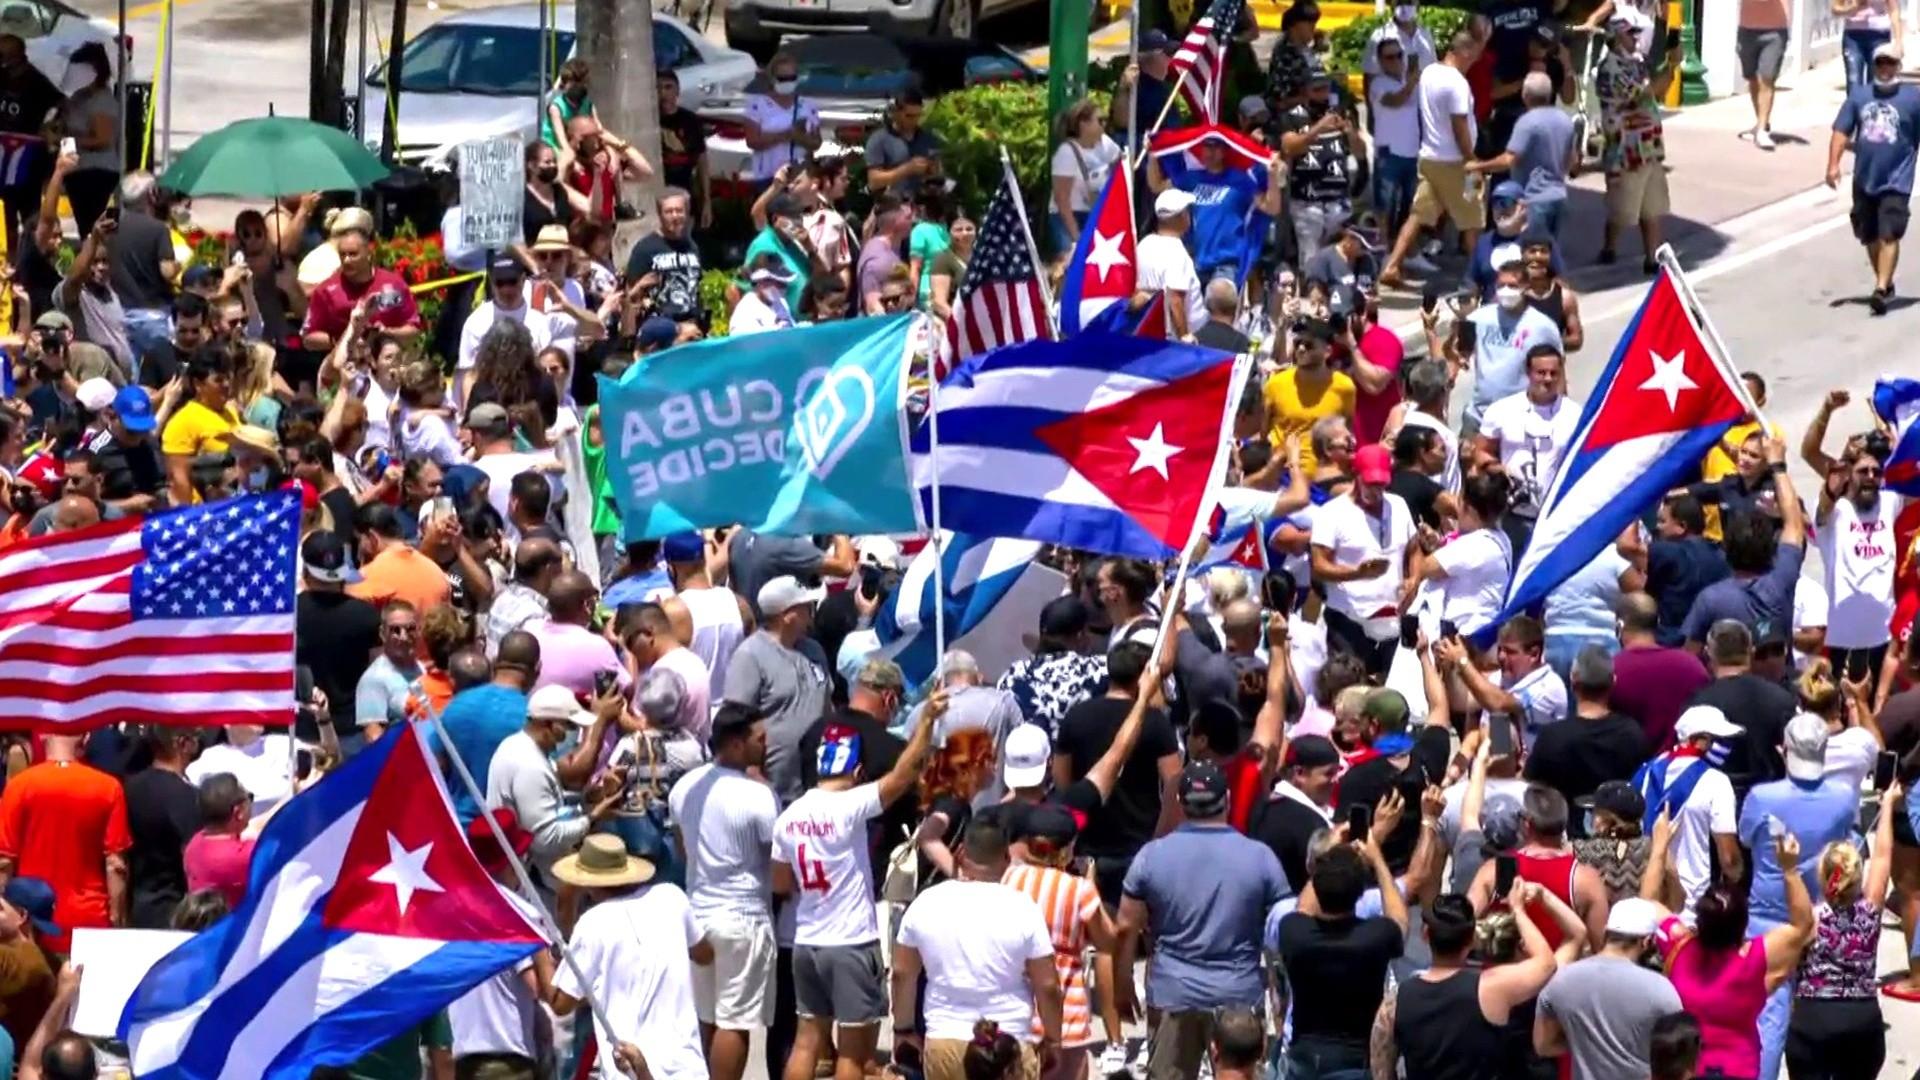 L.A. demonstrators show support of Cuba protests